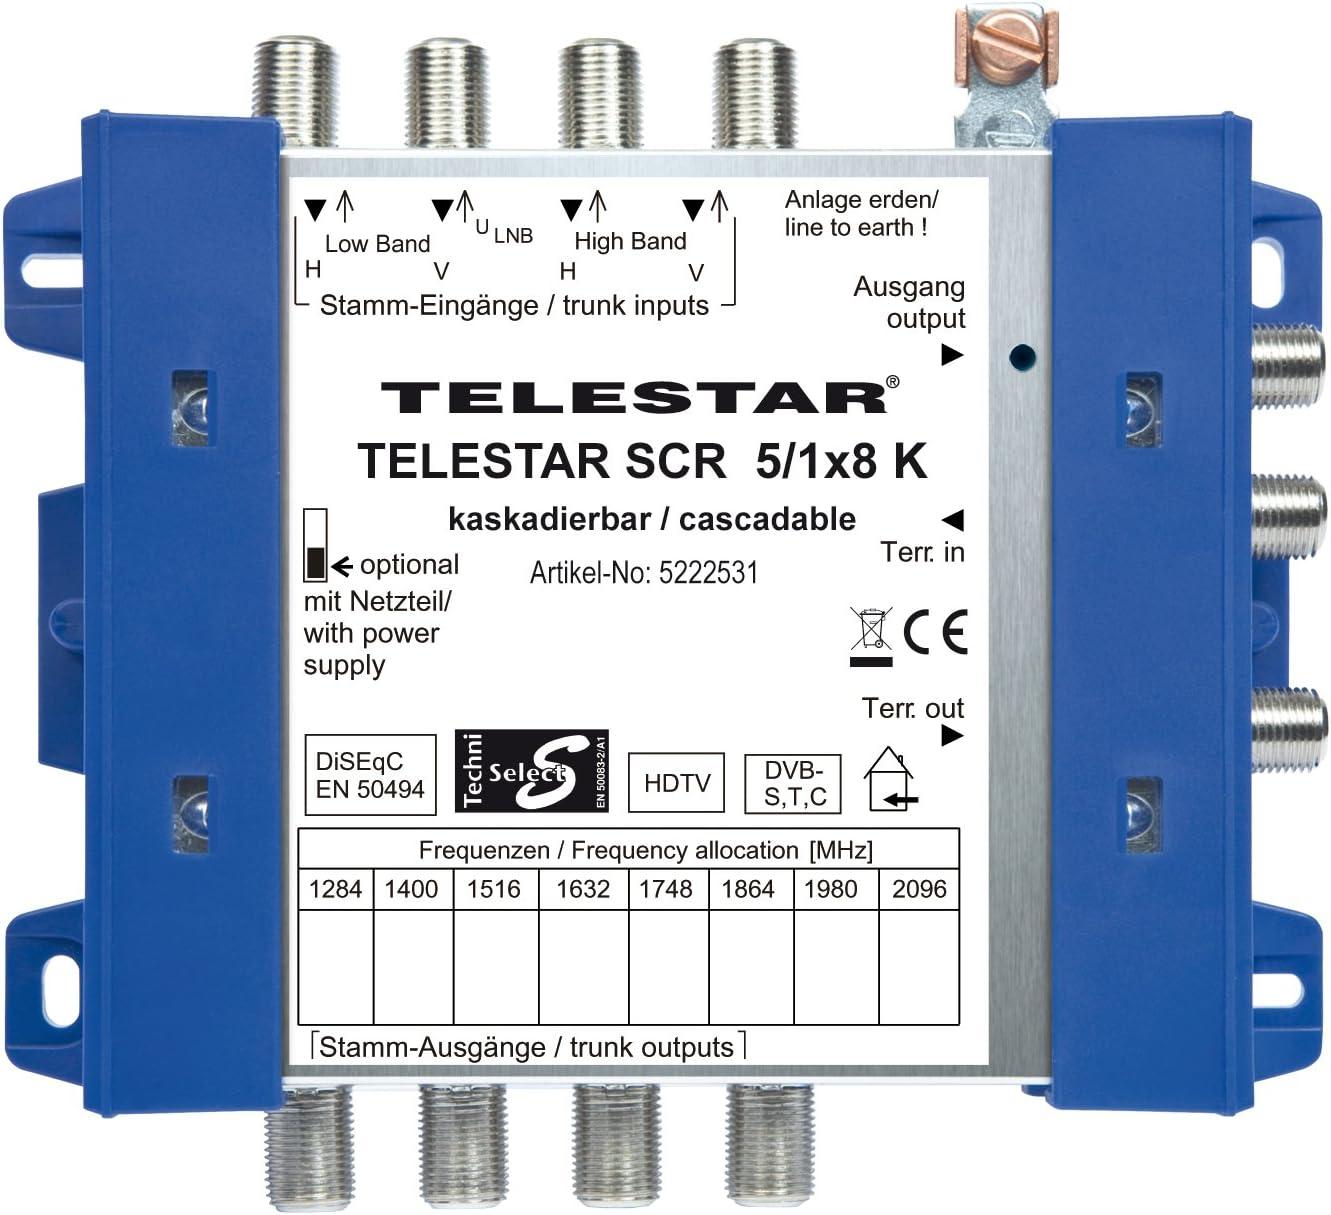 Telestar Scr 5 1x8 K Einkabellösung Inklusive 4 Elektronik